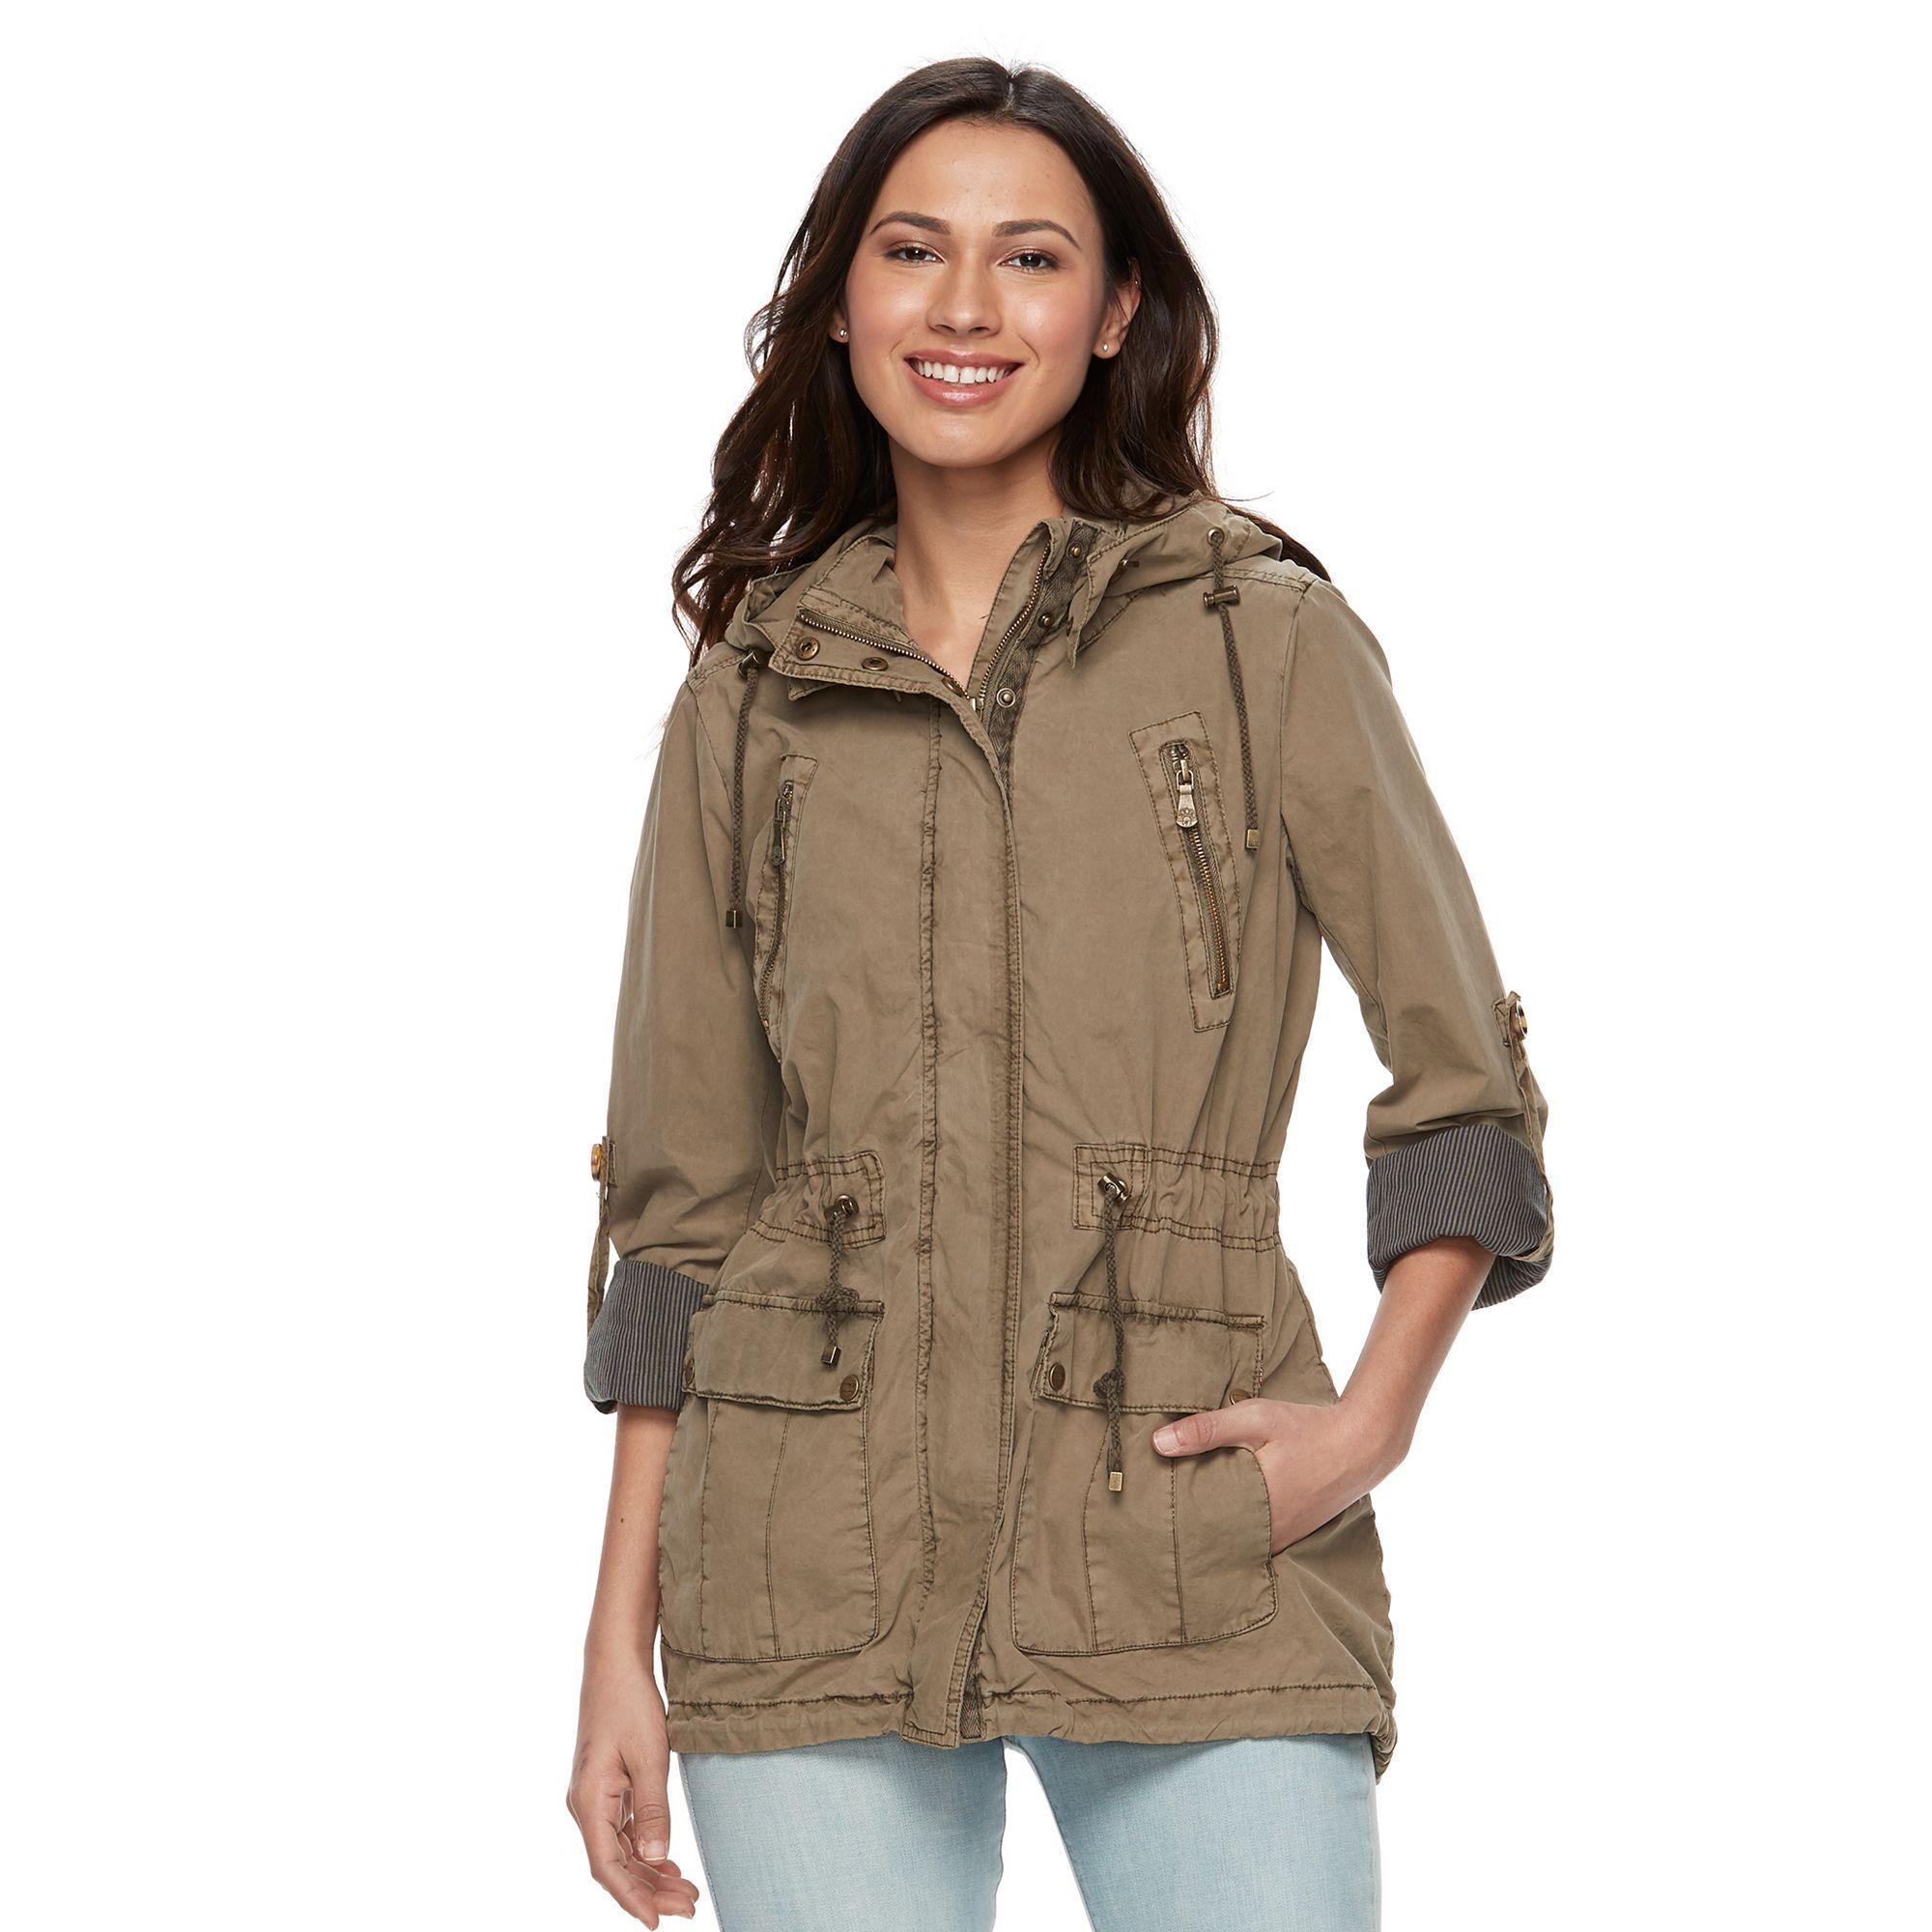 Women's Levi's Hooded Roll-Tab Anorak Jacket, Size: Medium, Blue (Navy)